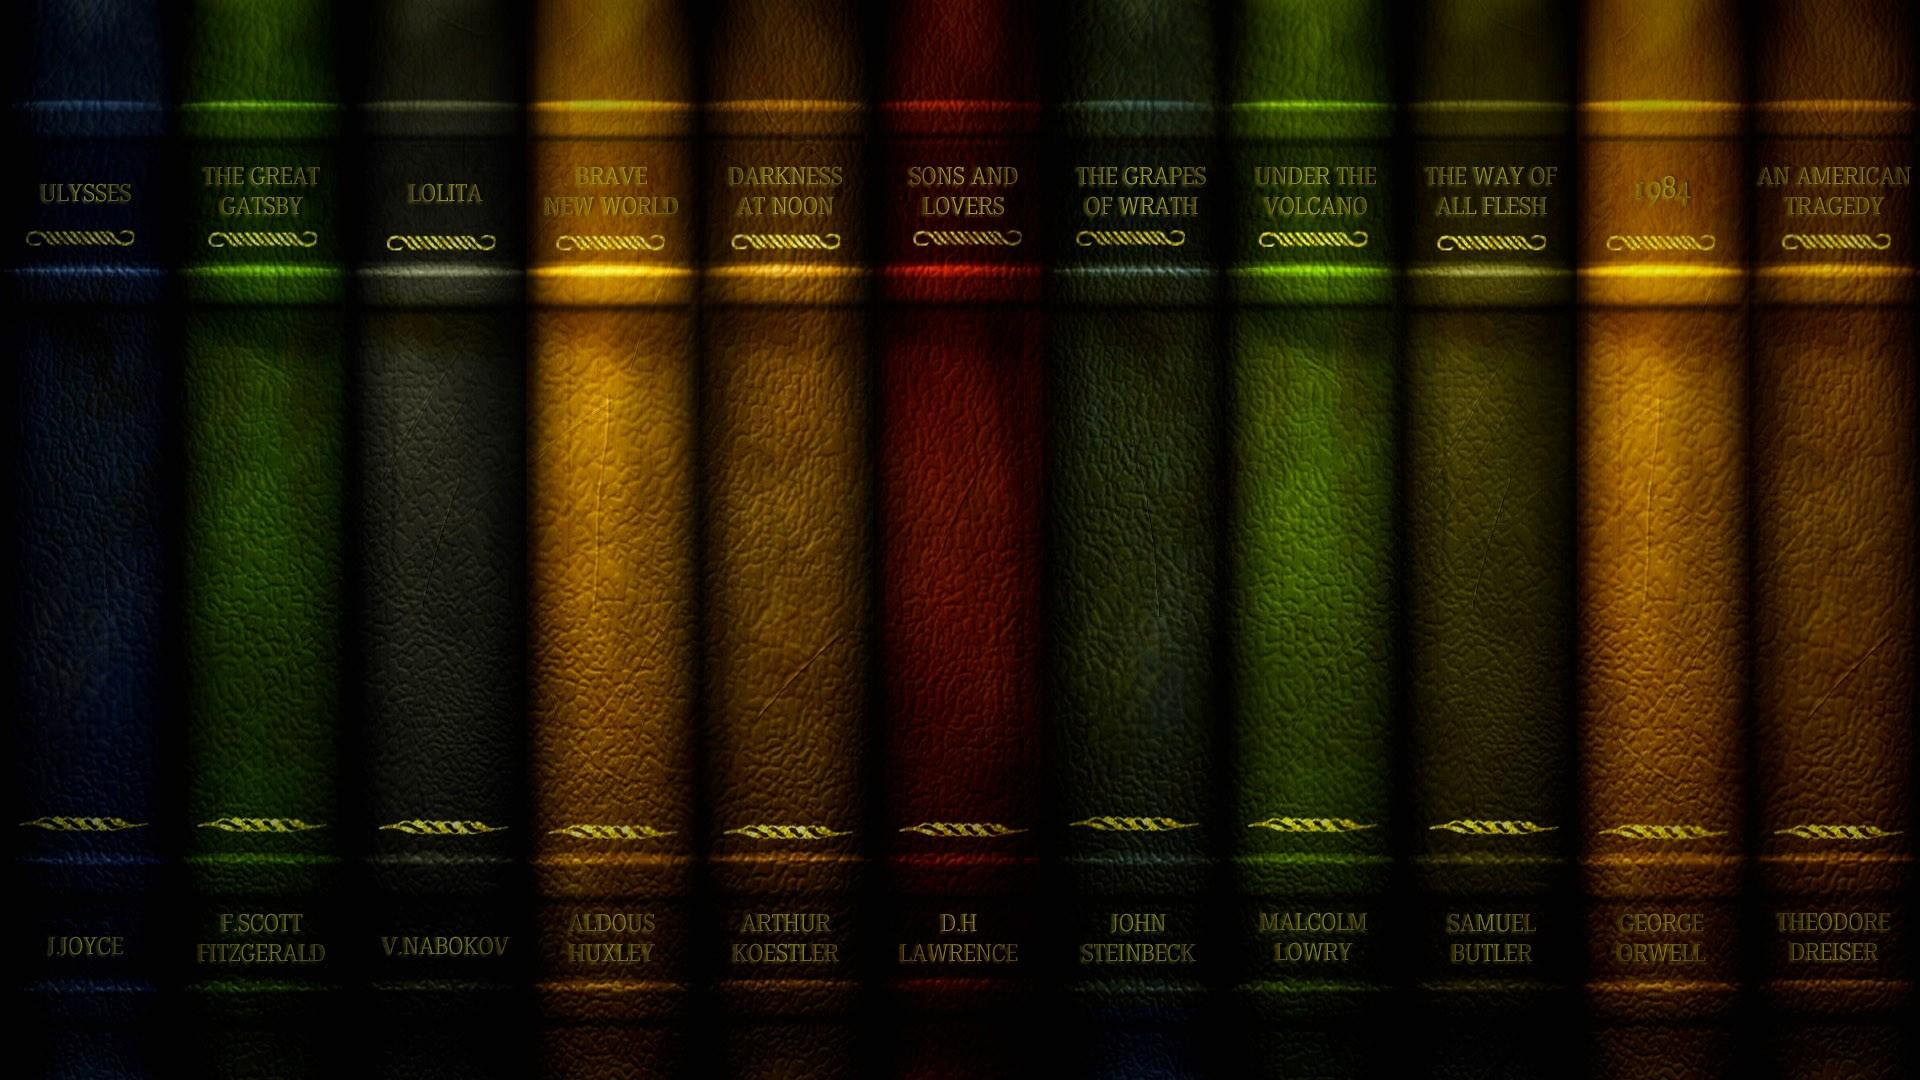 Wallpaper Books (61 Wallpapers)